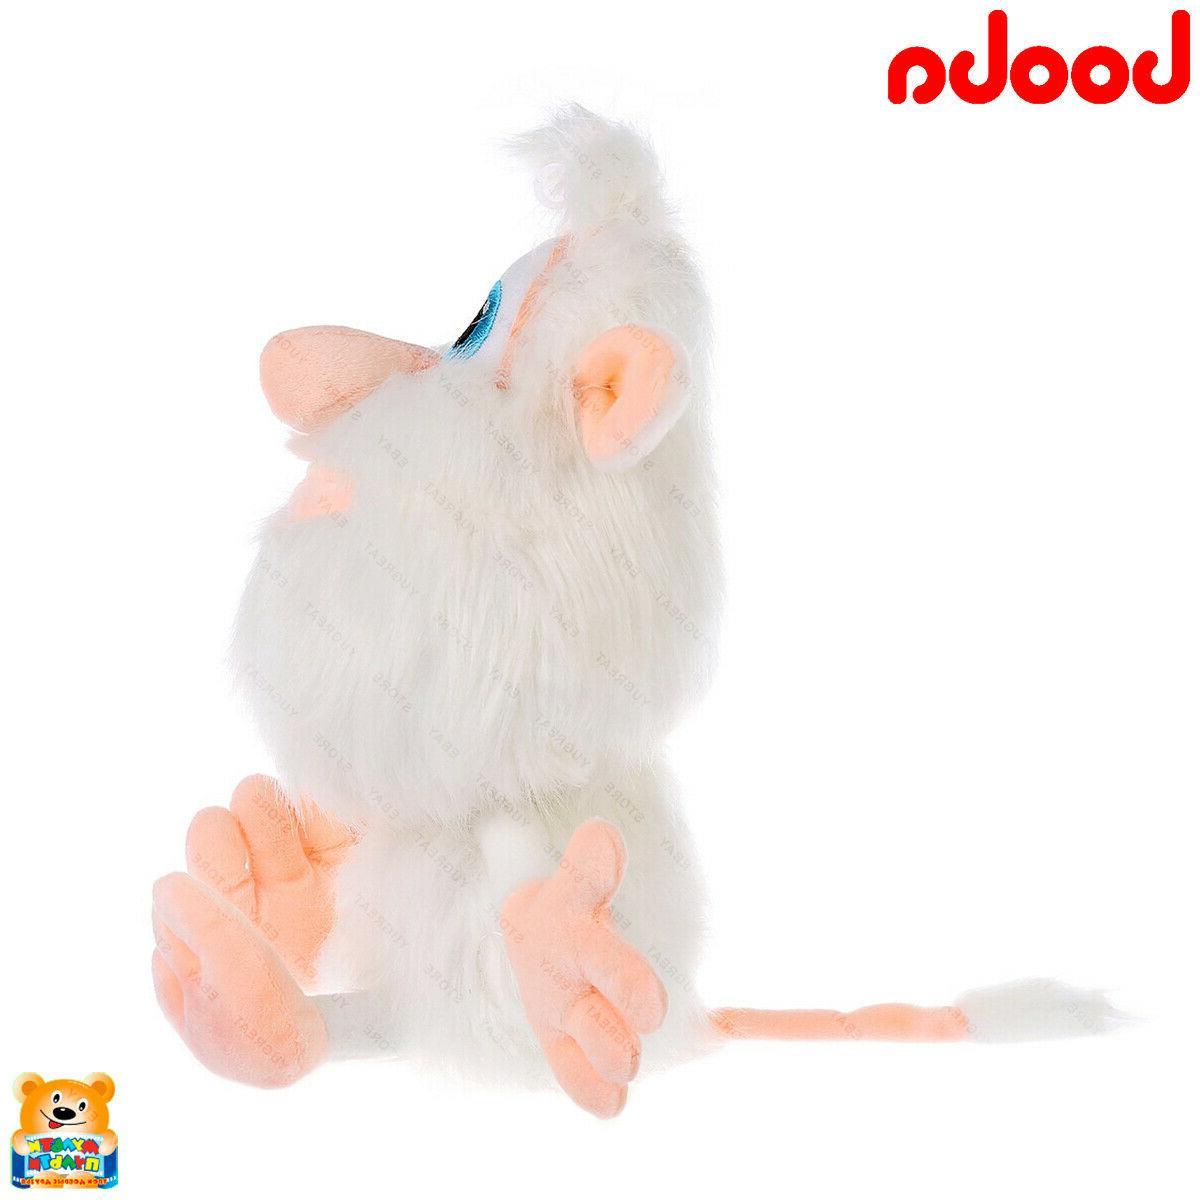 MULTI PULTI Booba, Buba, Talking w/Sound, Toy, Cartoon